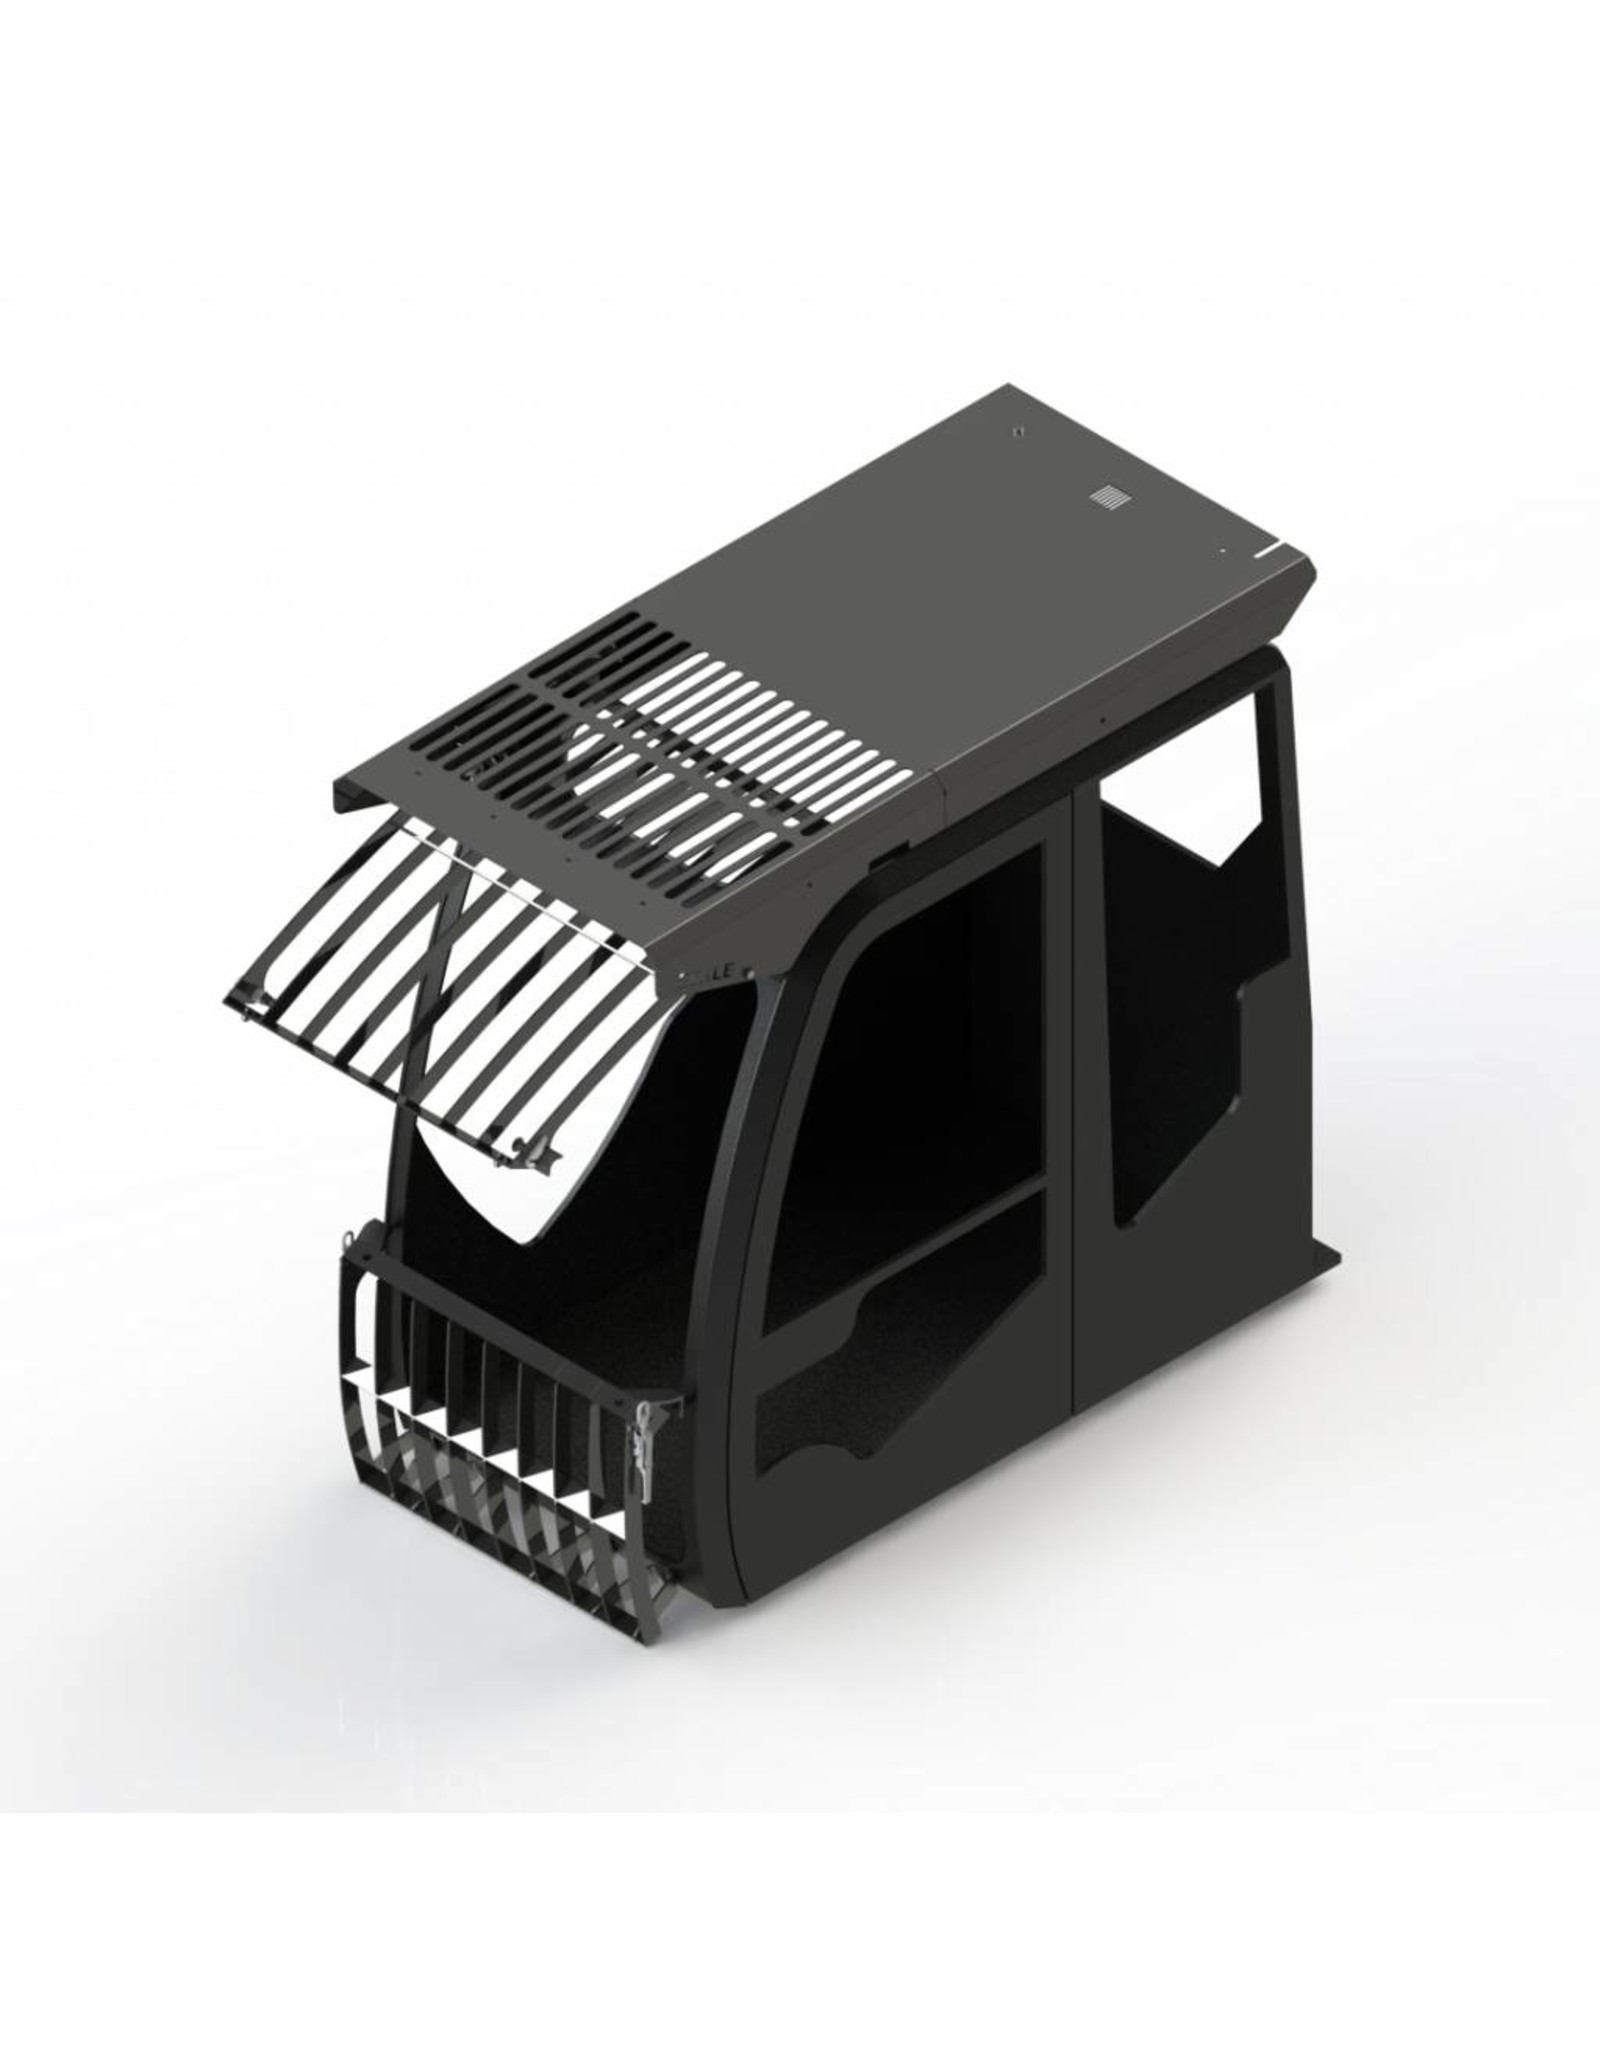 Echle Hartstahl GmbH FOPS für Sany SY265C